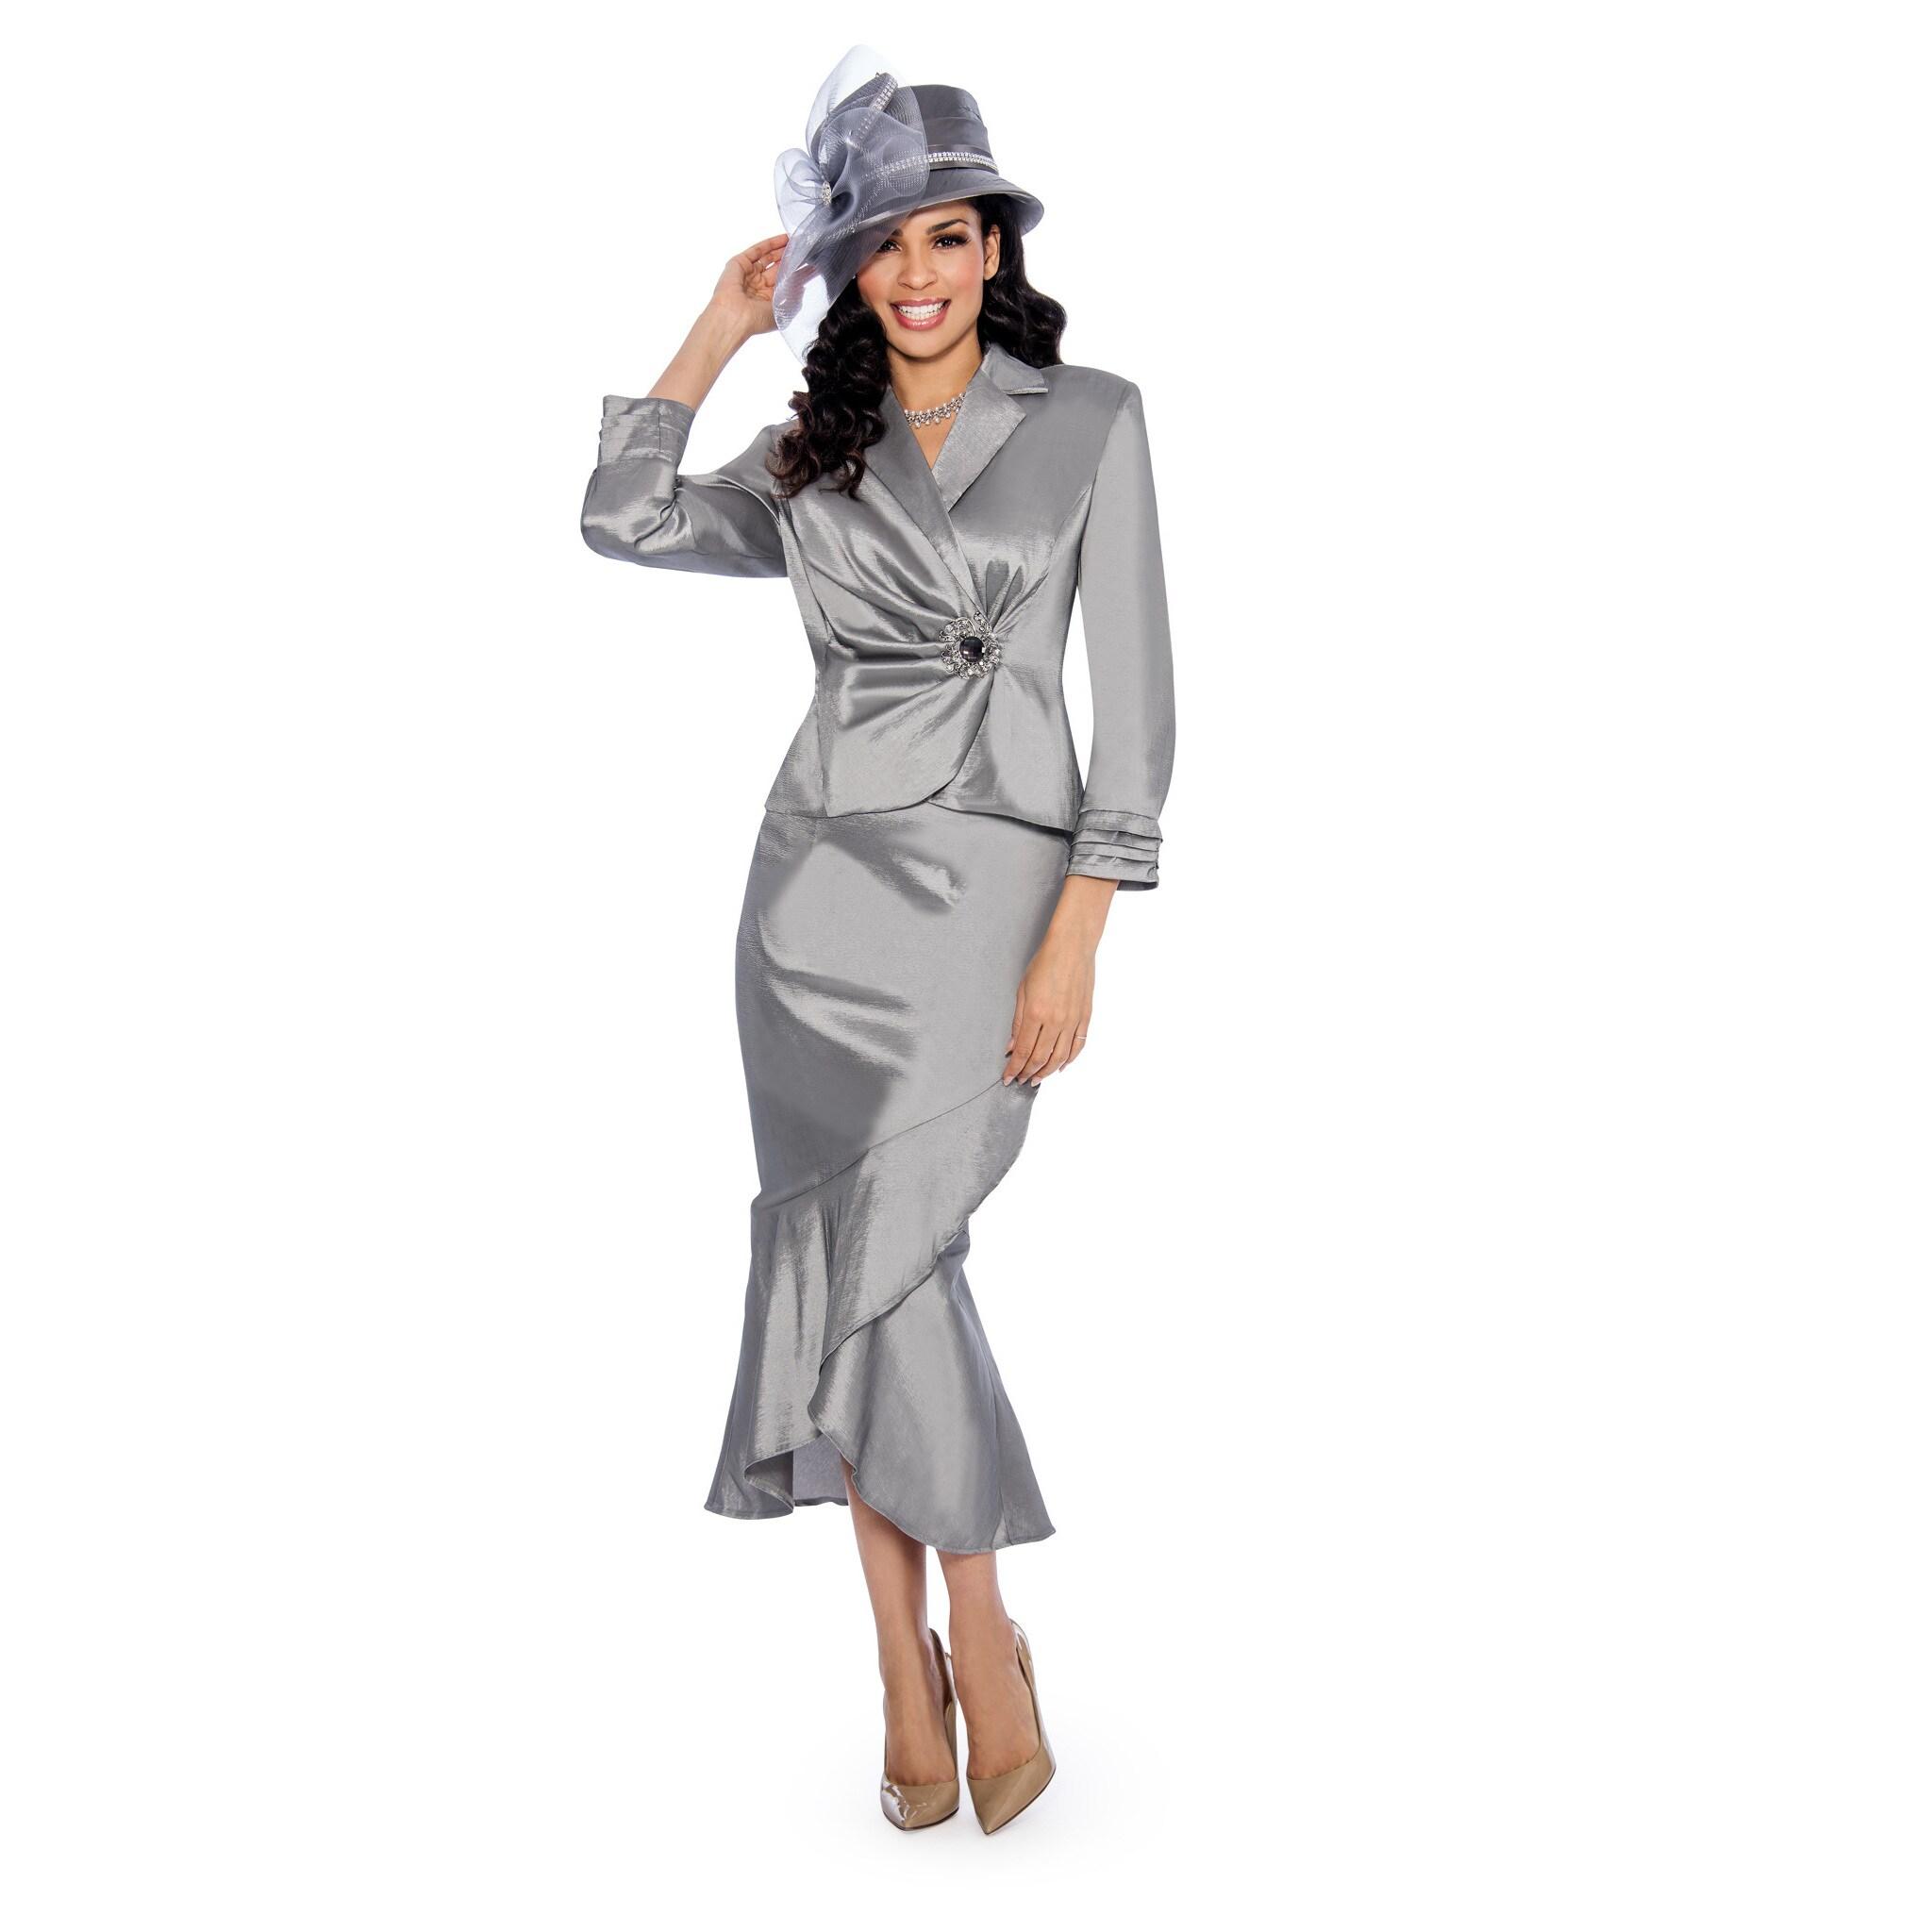 ea5540e5897 Shop Giovanna Signature Women s Stretch Taffeta Rhinestone Buckle 2-Piece Skirt  Suit - Free Shipping Today - Overstock - 16994185